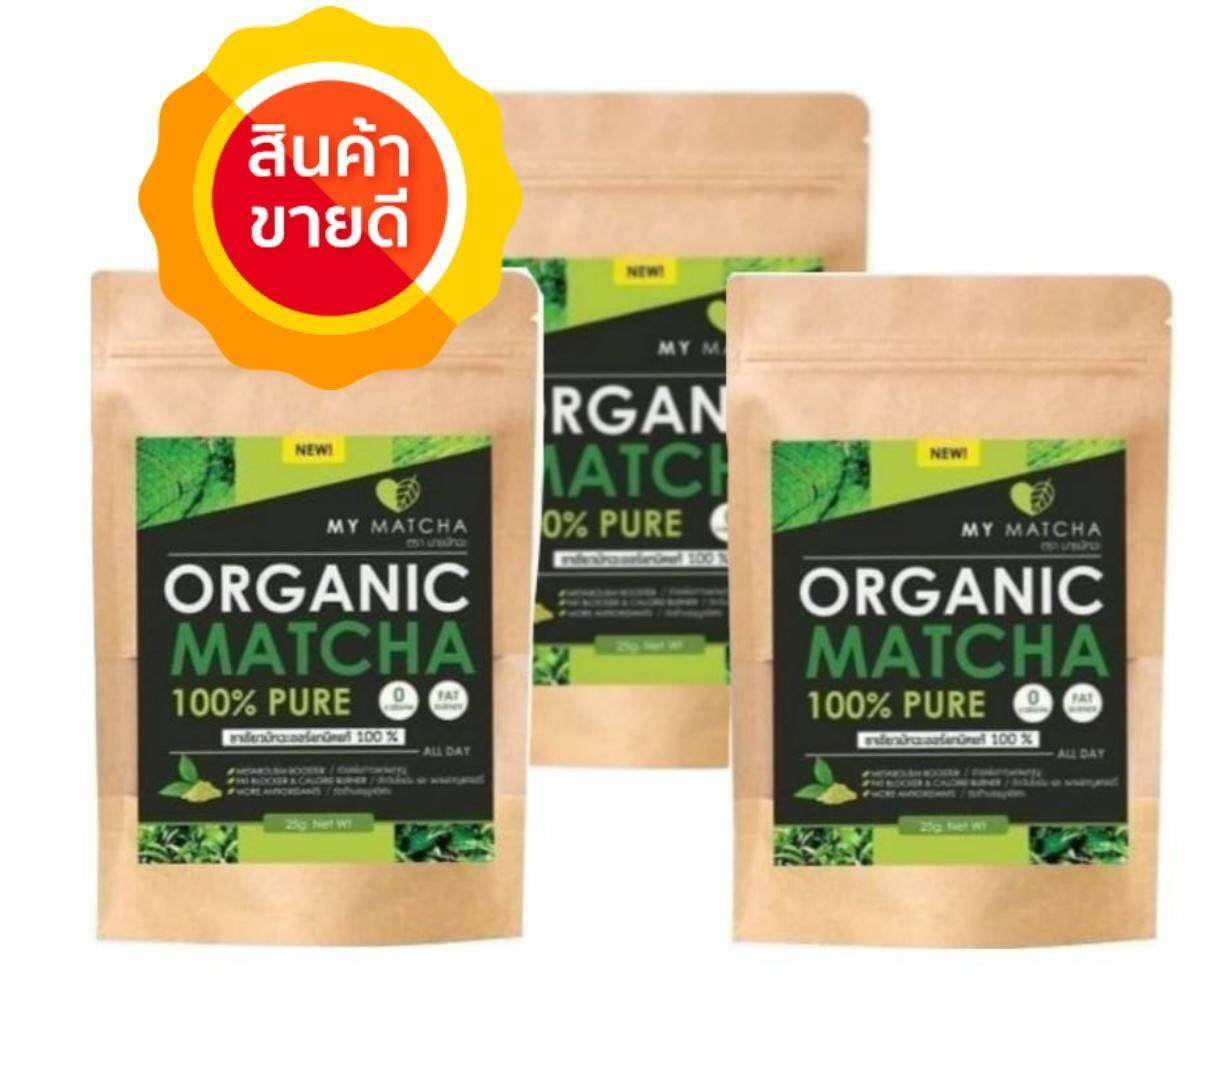 My Matcha Organic Matcha 100% Pure ชาเขียวมัทฉะออร์แกนิคแท้100% (3 ซอง ).